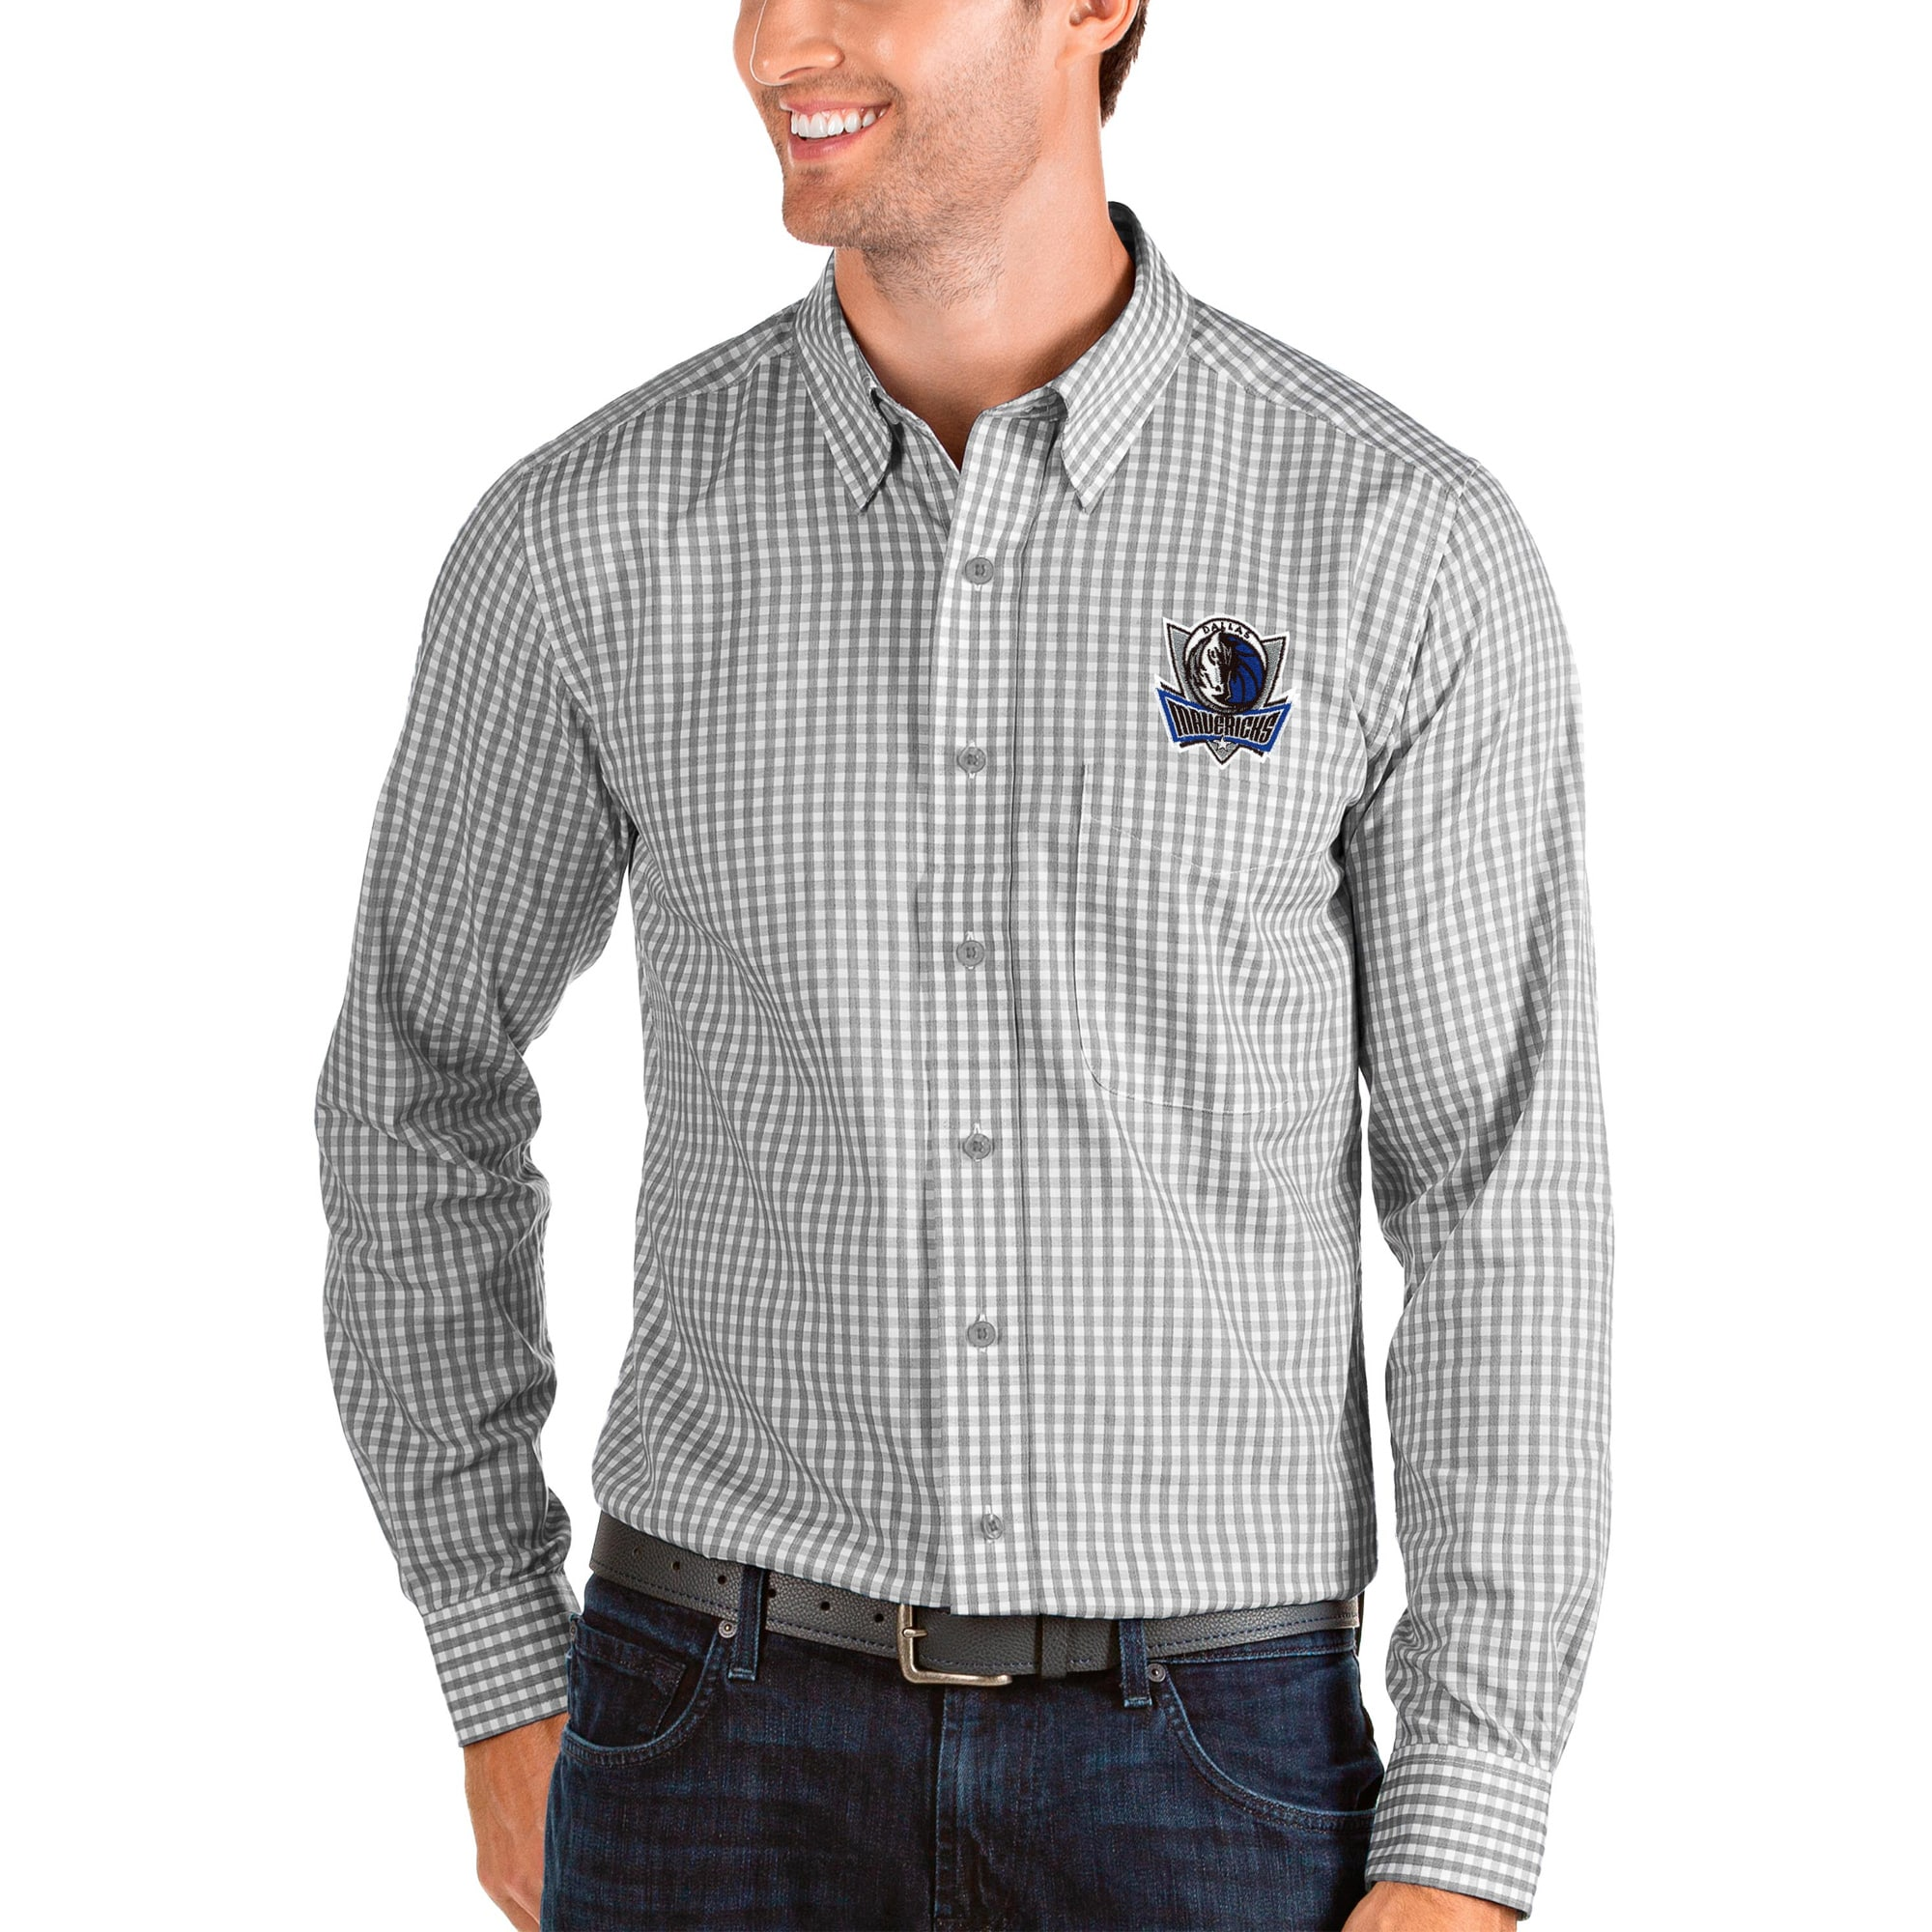 Dallas Mavericks Antigua Structure Long Sleeve Button-Up Shirt - Charcoal/White